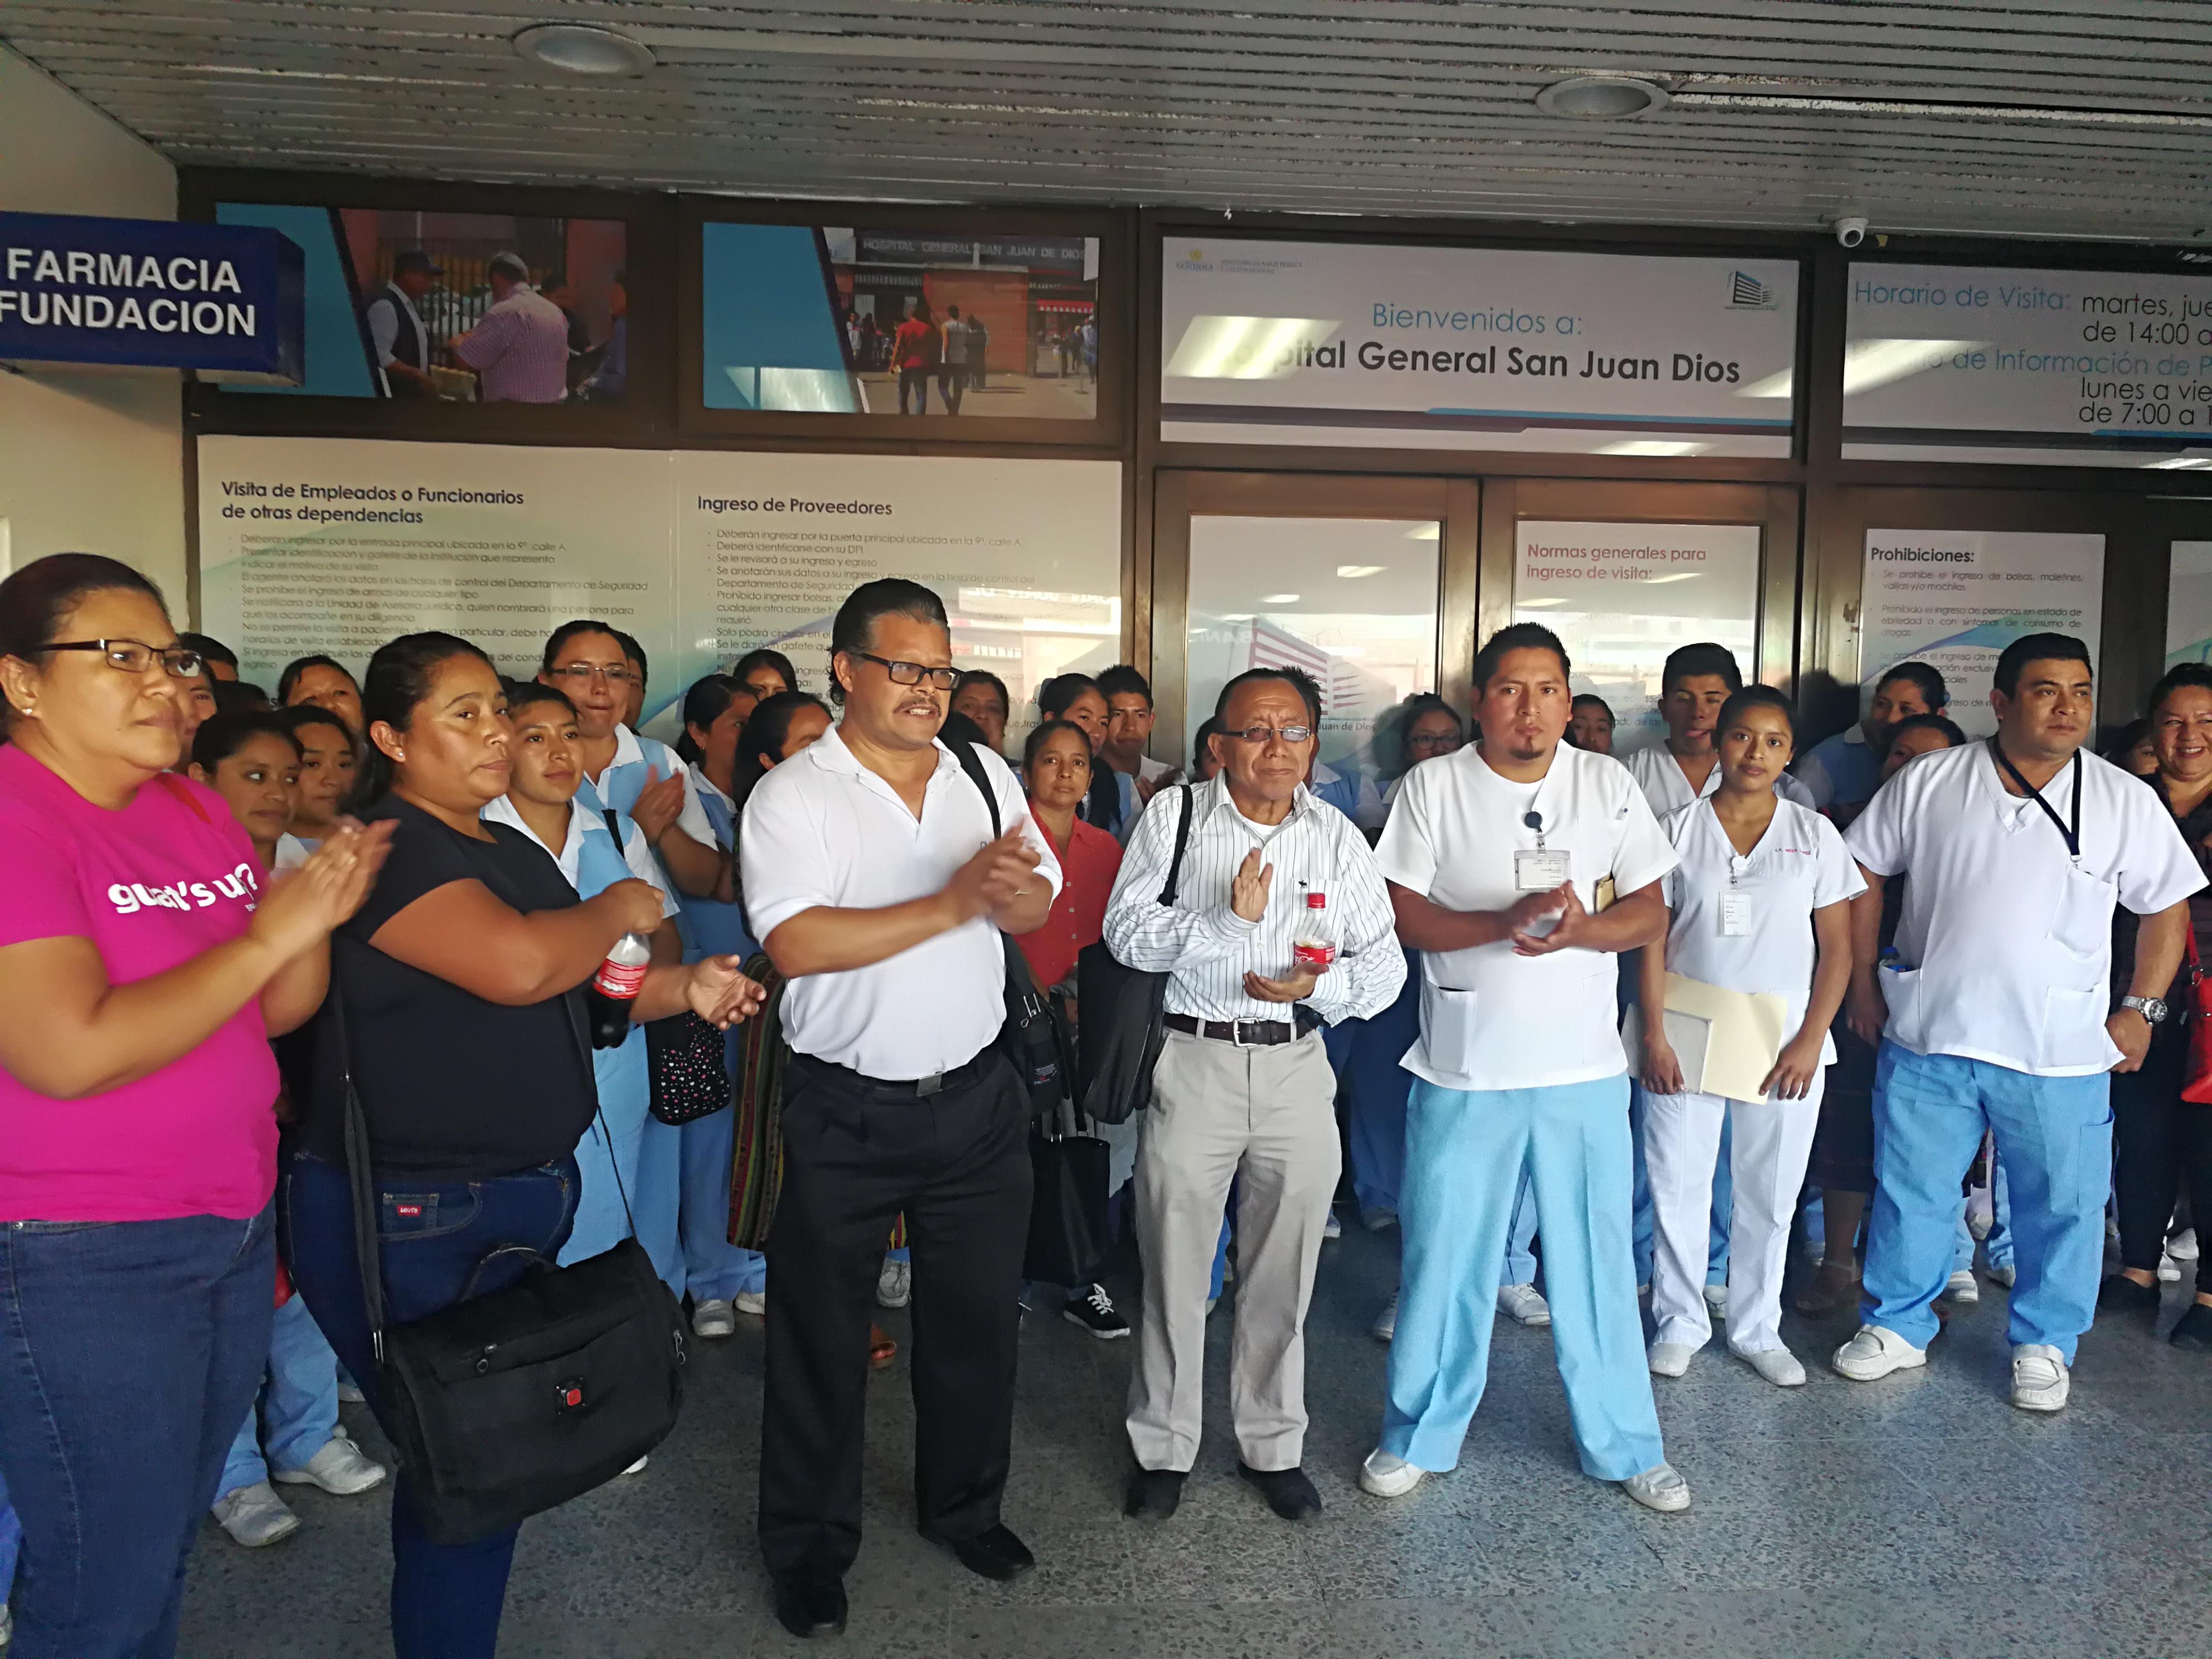 Un grupo de enfermeros reclama frente al Hospital San Juan de Dios por mejores salarios. (Foto Prensa Libre: Ana Lucía Ola)